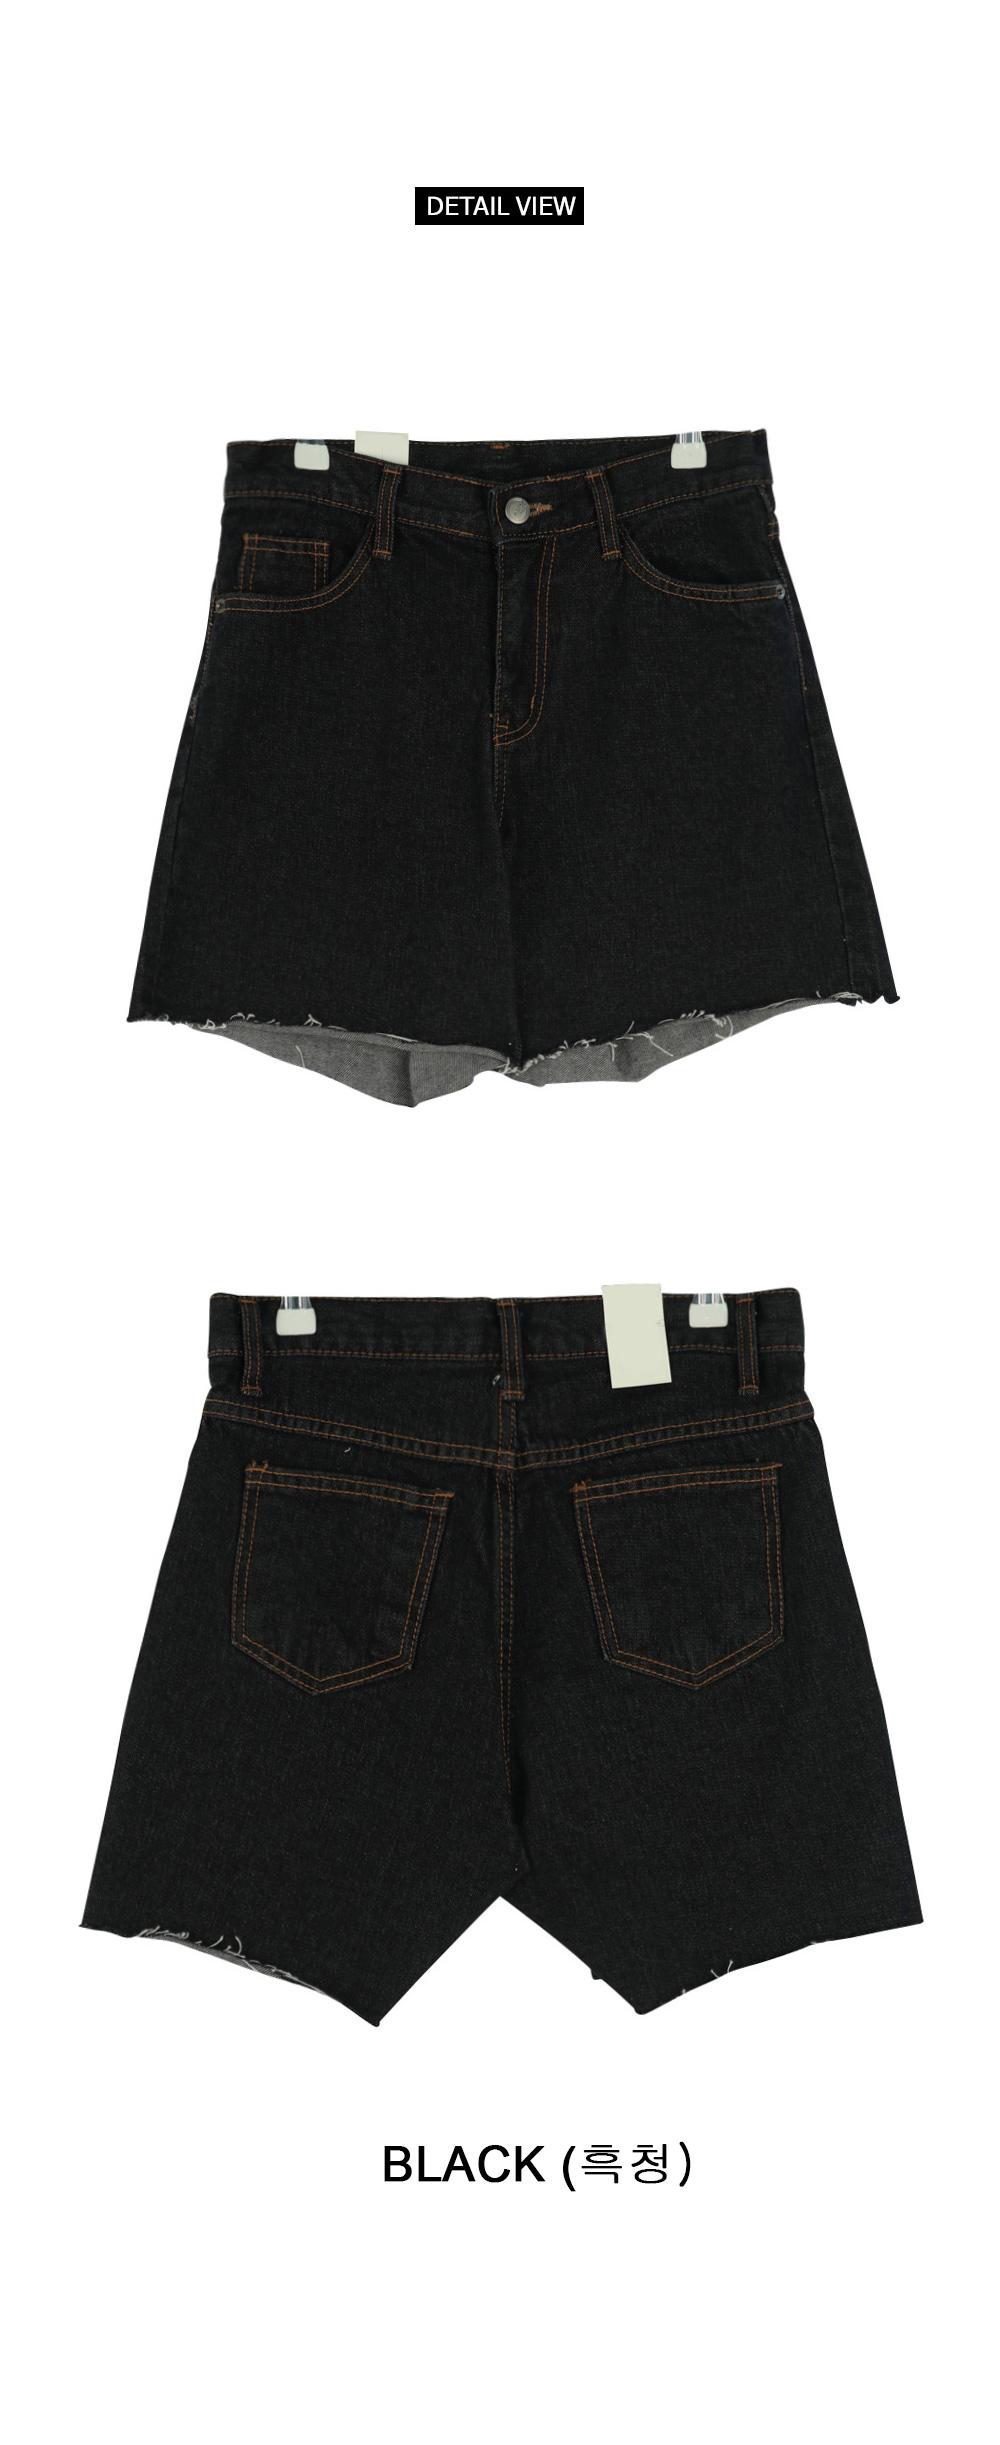 Maternity shorts denim shorts